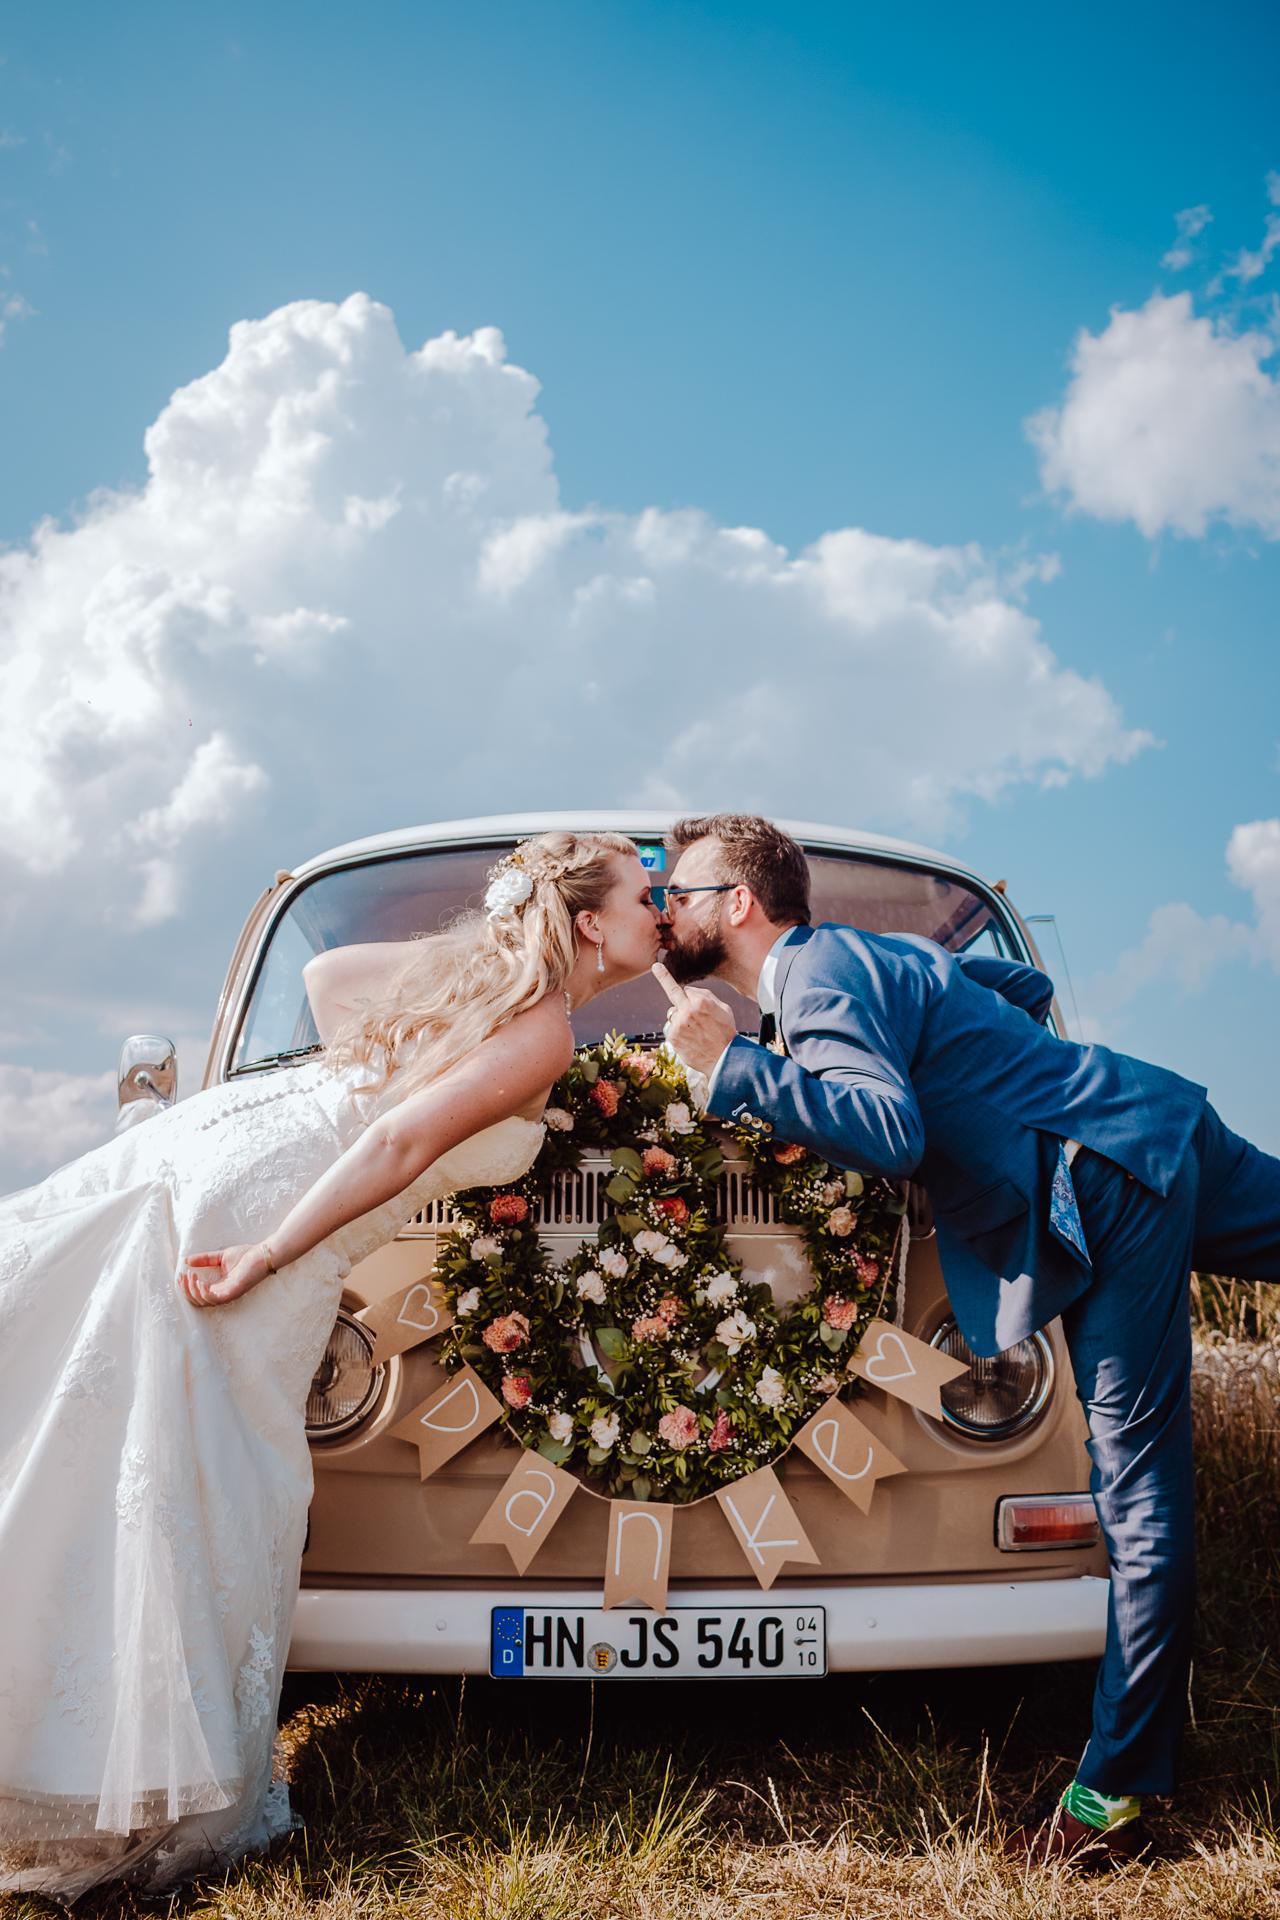 lisaundjonny_website_jasminjohanna_72dpi_100pz_1920-Lisa&Jonny — Coupleshooting1 –AdobeRGB — 200dpi — 071